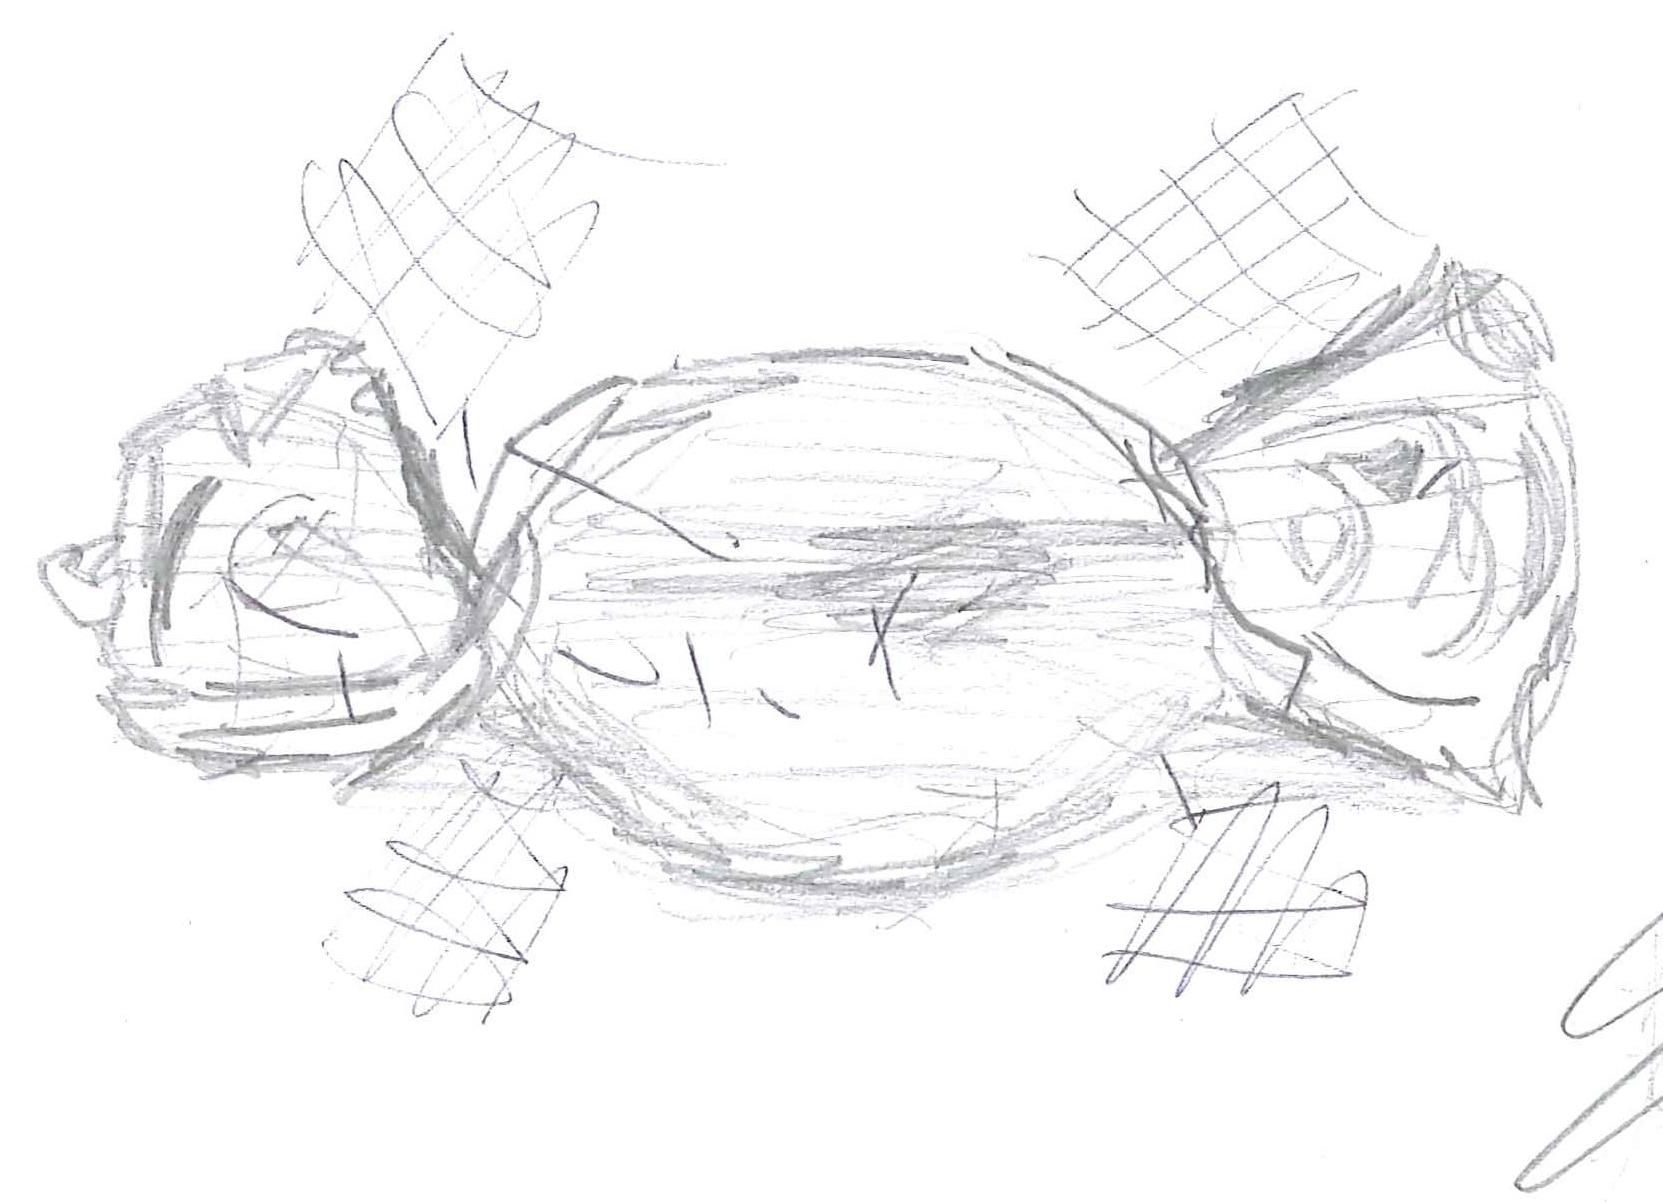 Observational Drawings Ks3